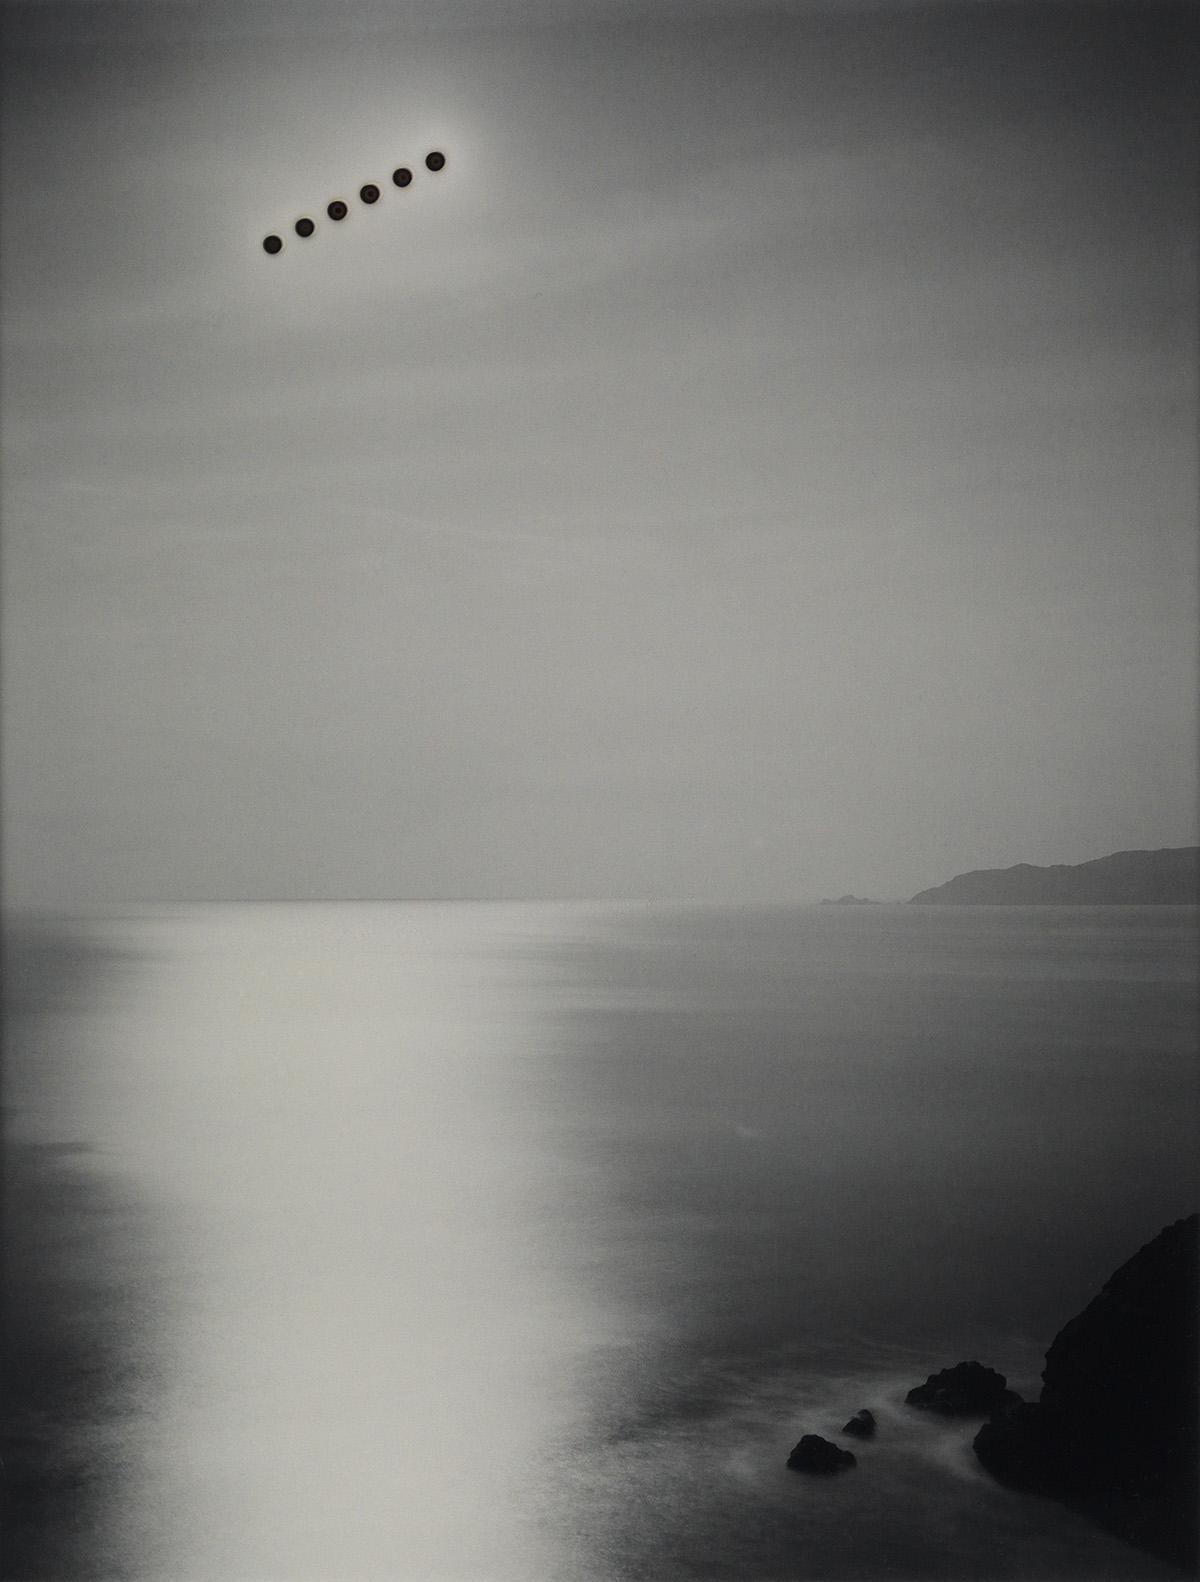 CHRIS MCCAW (1971- ) Sunburned GSP #319 (Pacific Ocean).